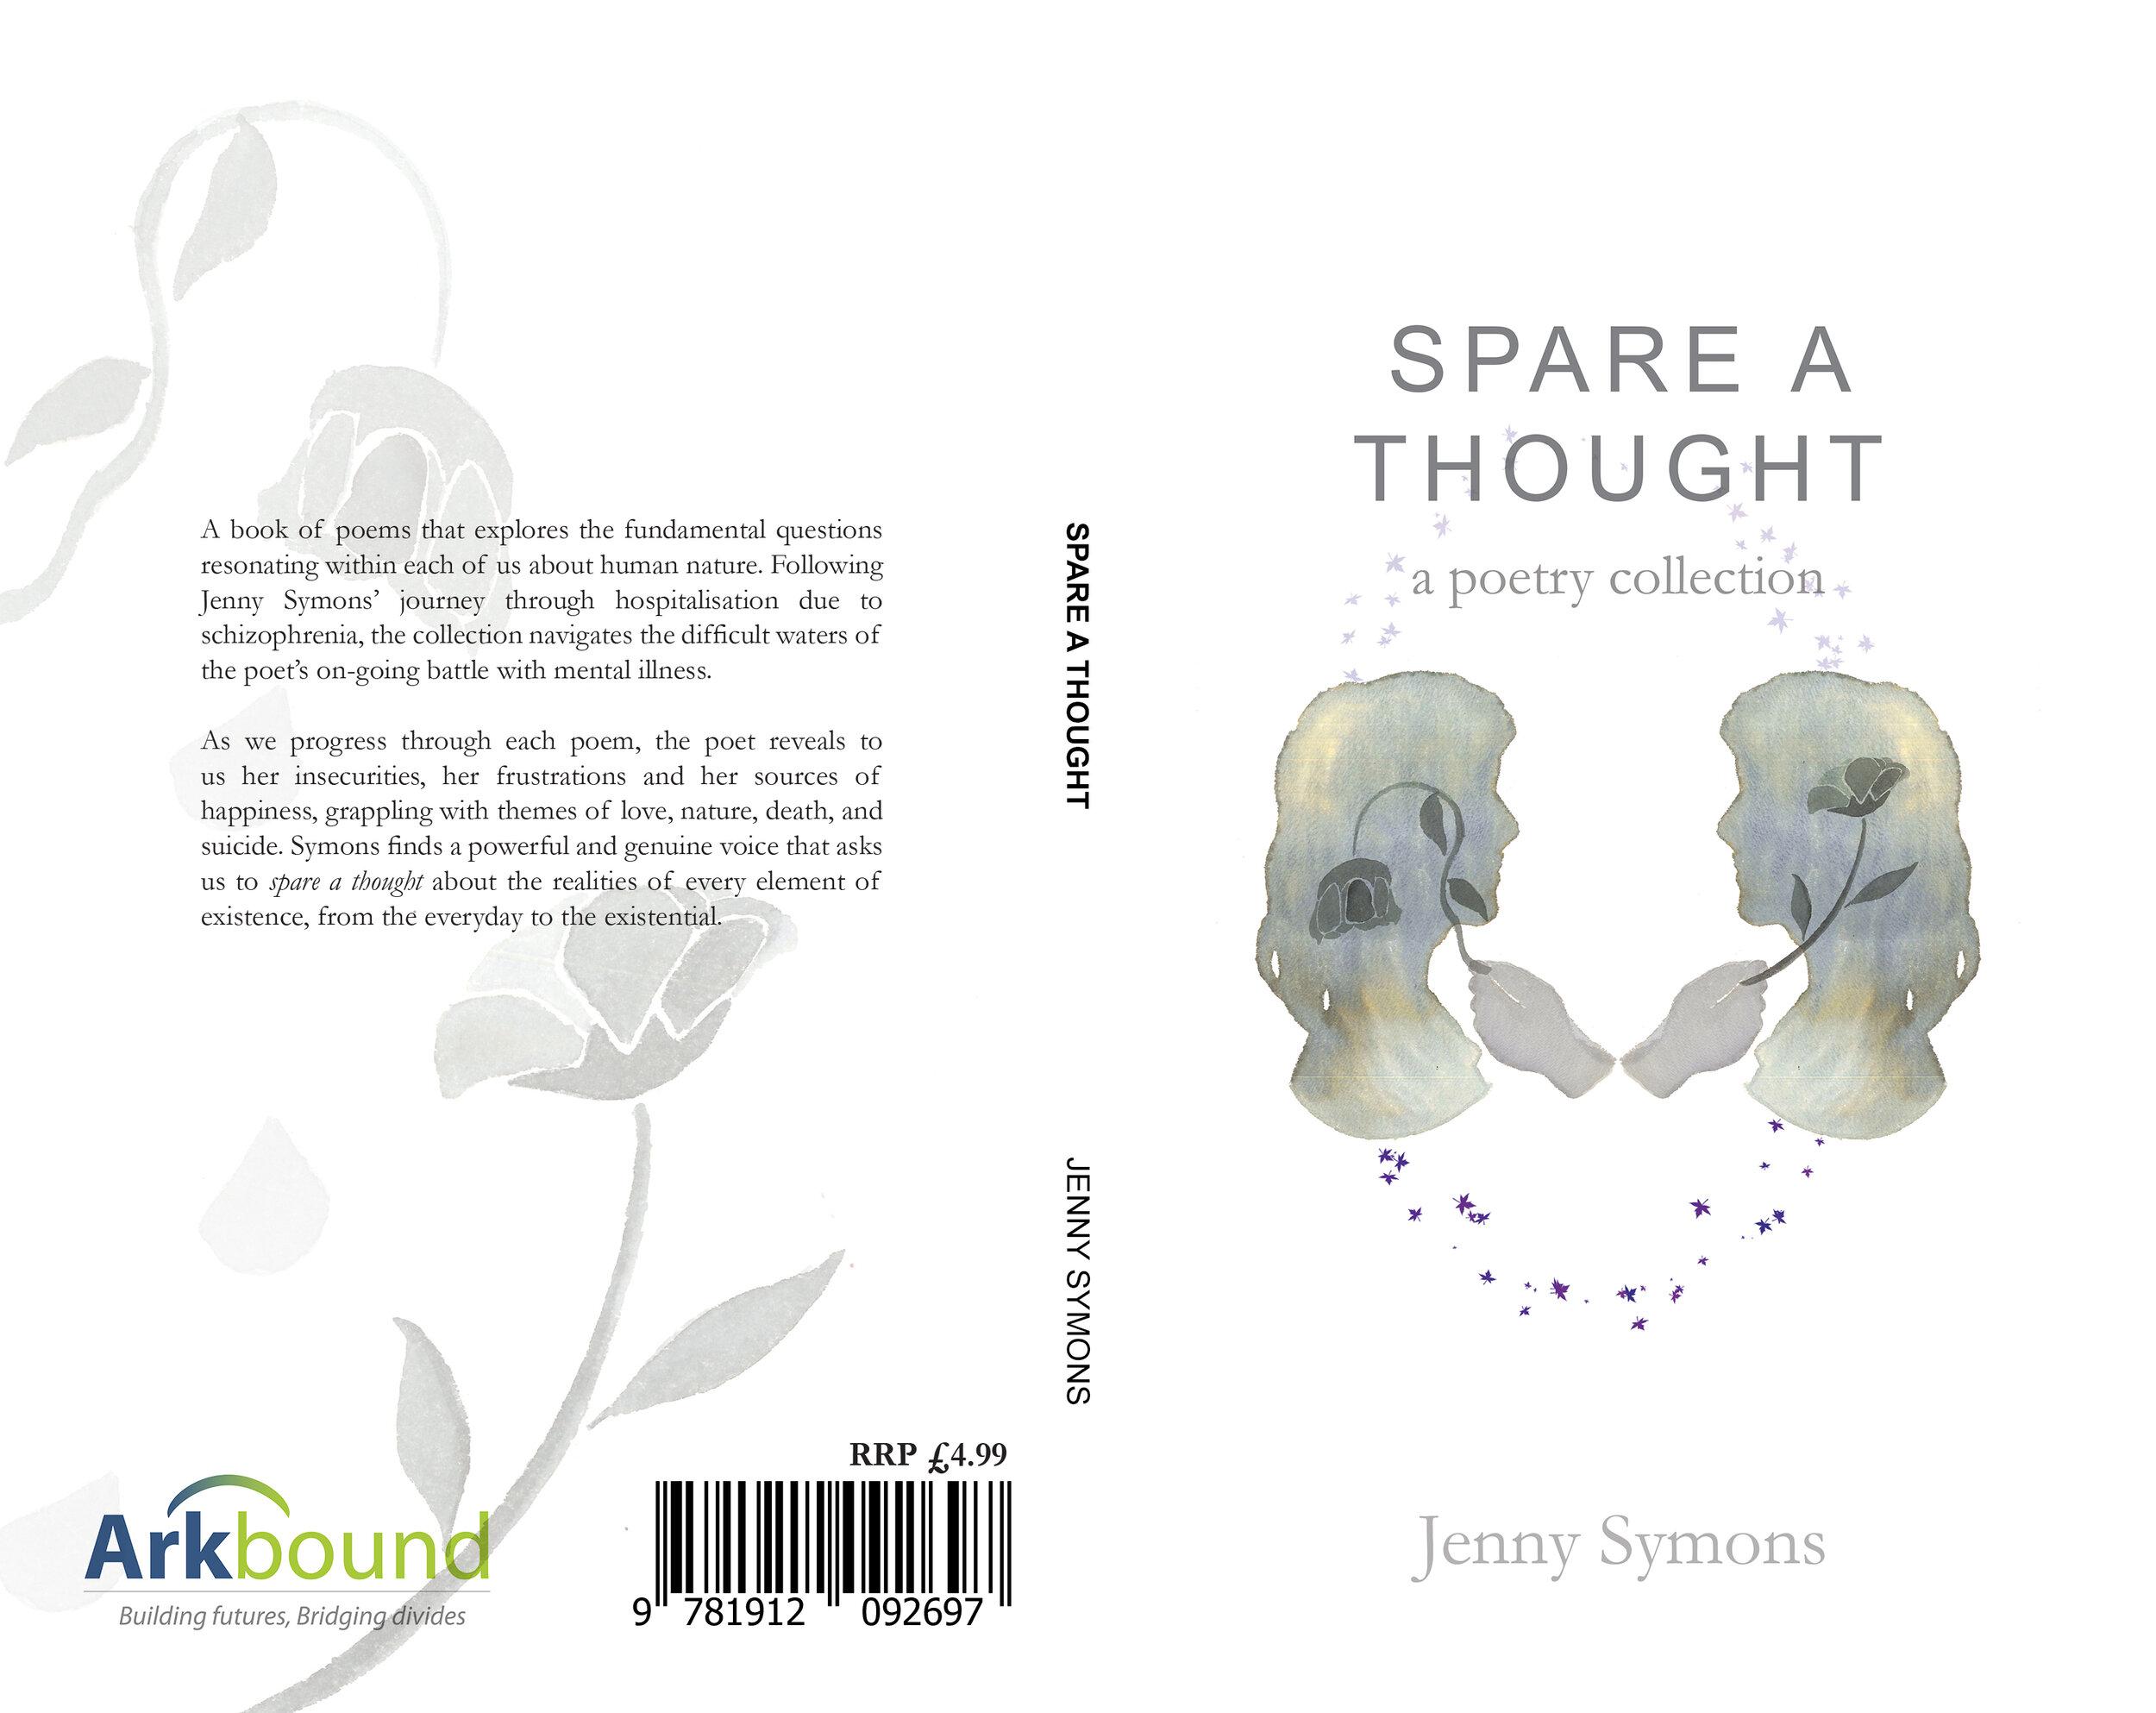 Spare a Thought by Jenny Symons